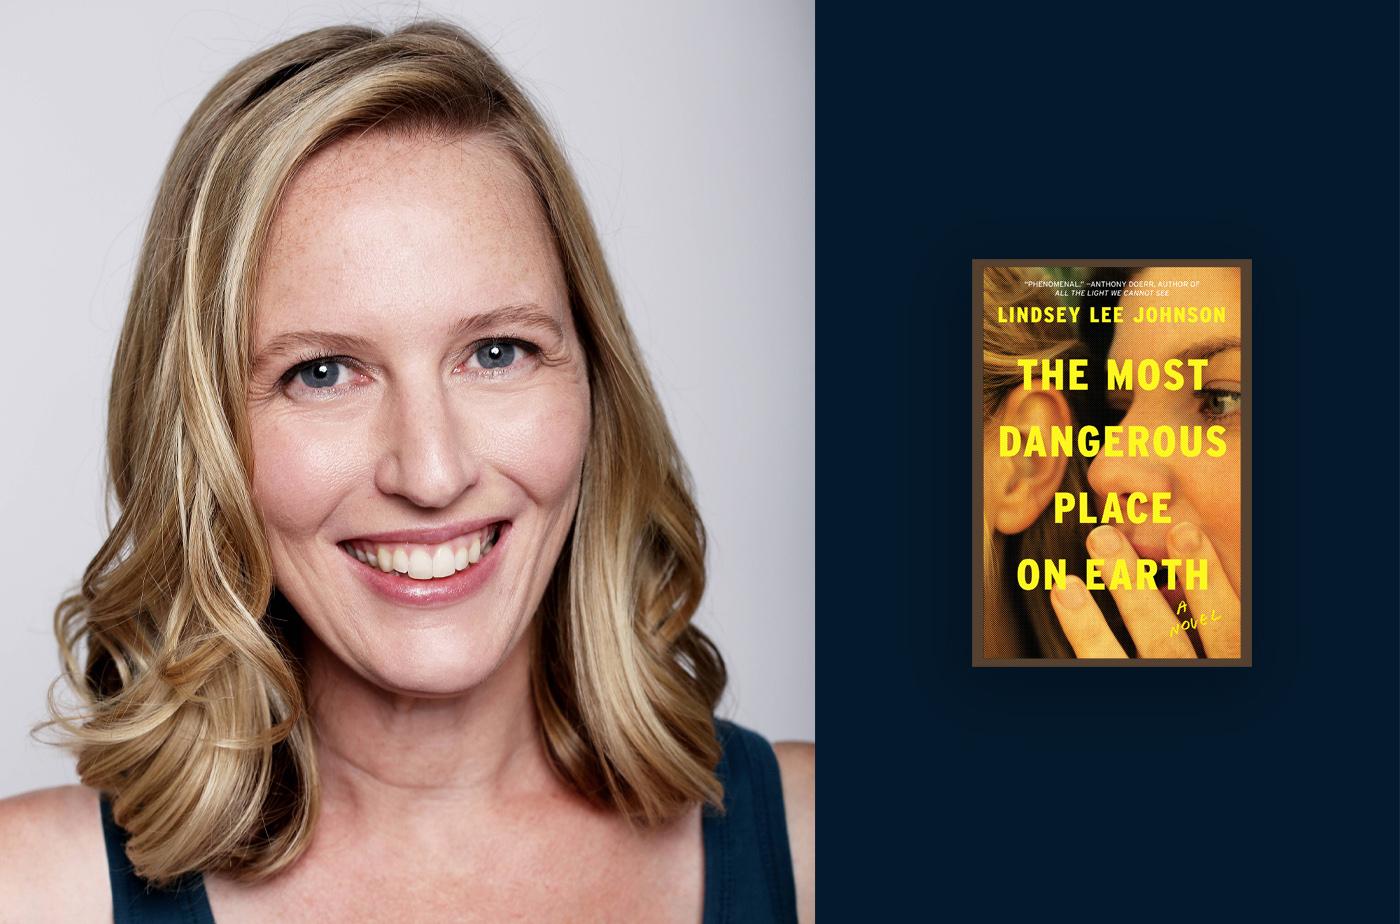 Catapult online classes: Lindsey Lee Johnson, 6-Week Online Fiction Workshop: Advanced Scene-Writing, Fiction, Workshop